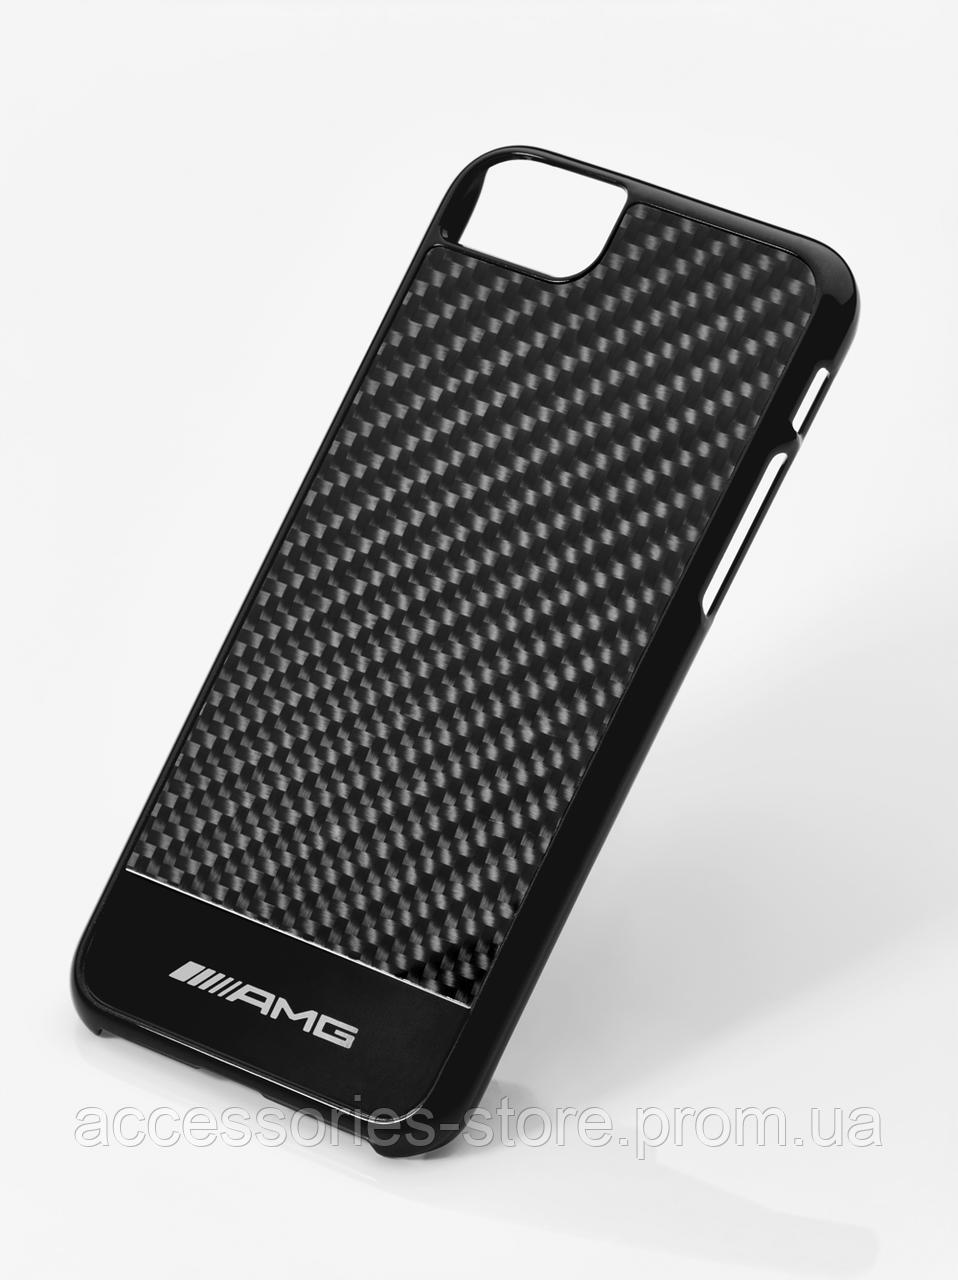 Чехол для iPhone 7 Mercedes-Benz AMG Cover for iPhone® 7, Black carbon